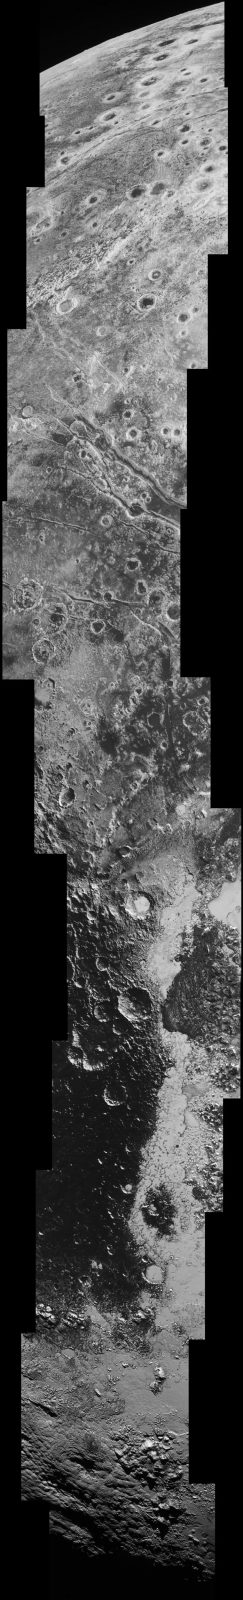 Las montañas heladas en la superficie de Plutón fotografiadas por la sonda New Horizons.